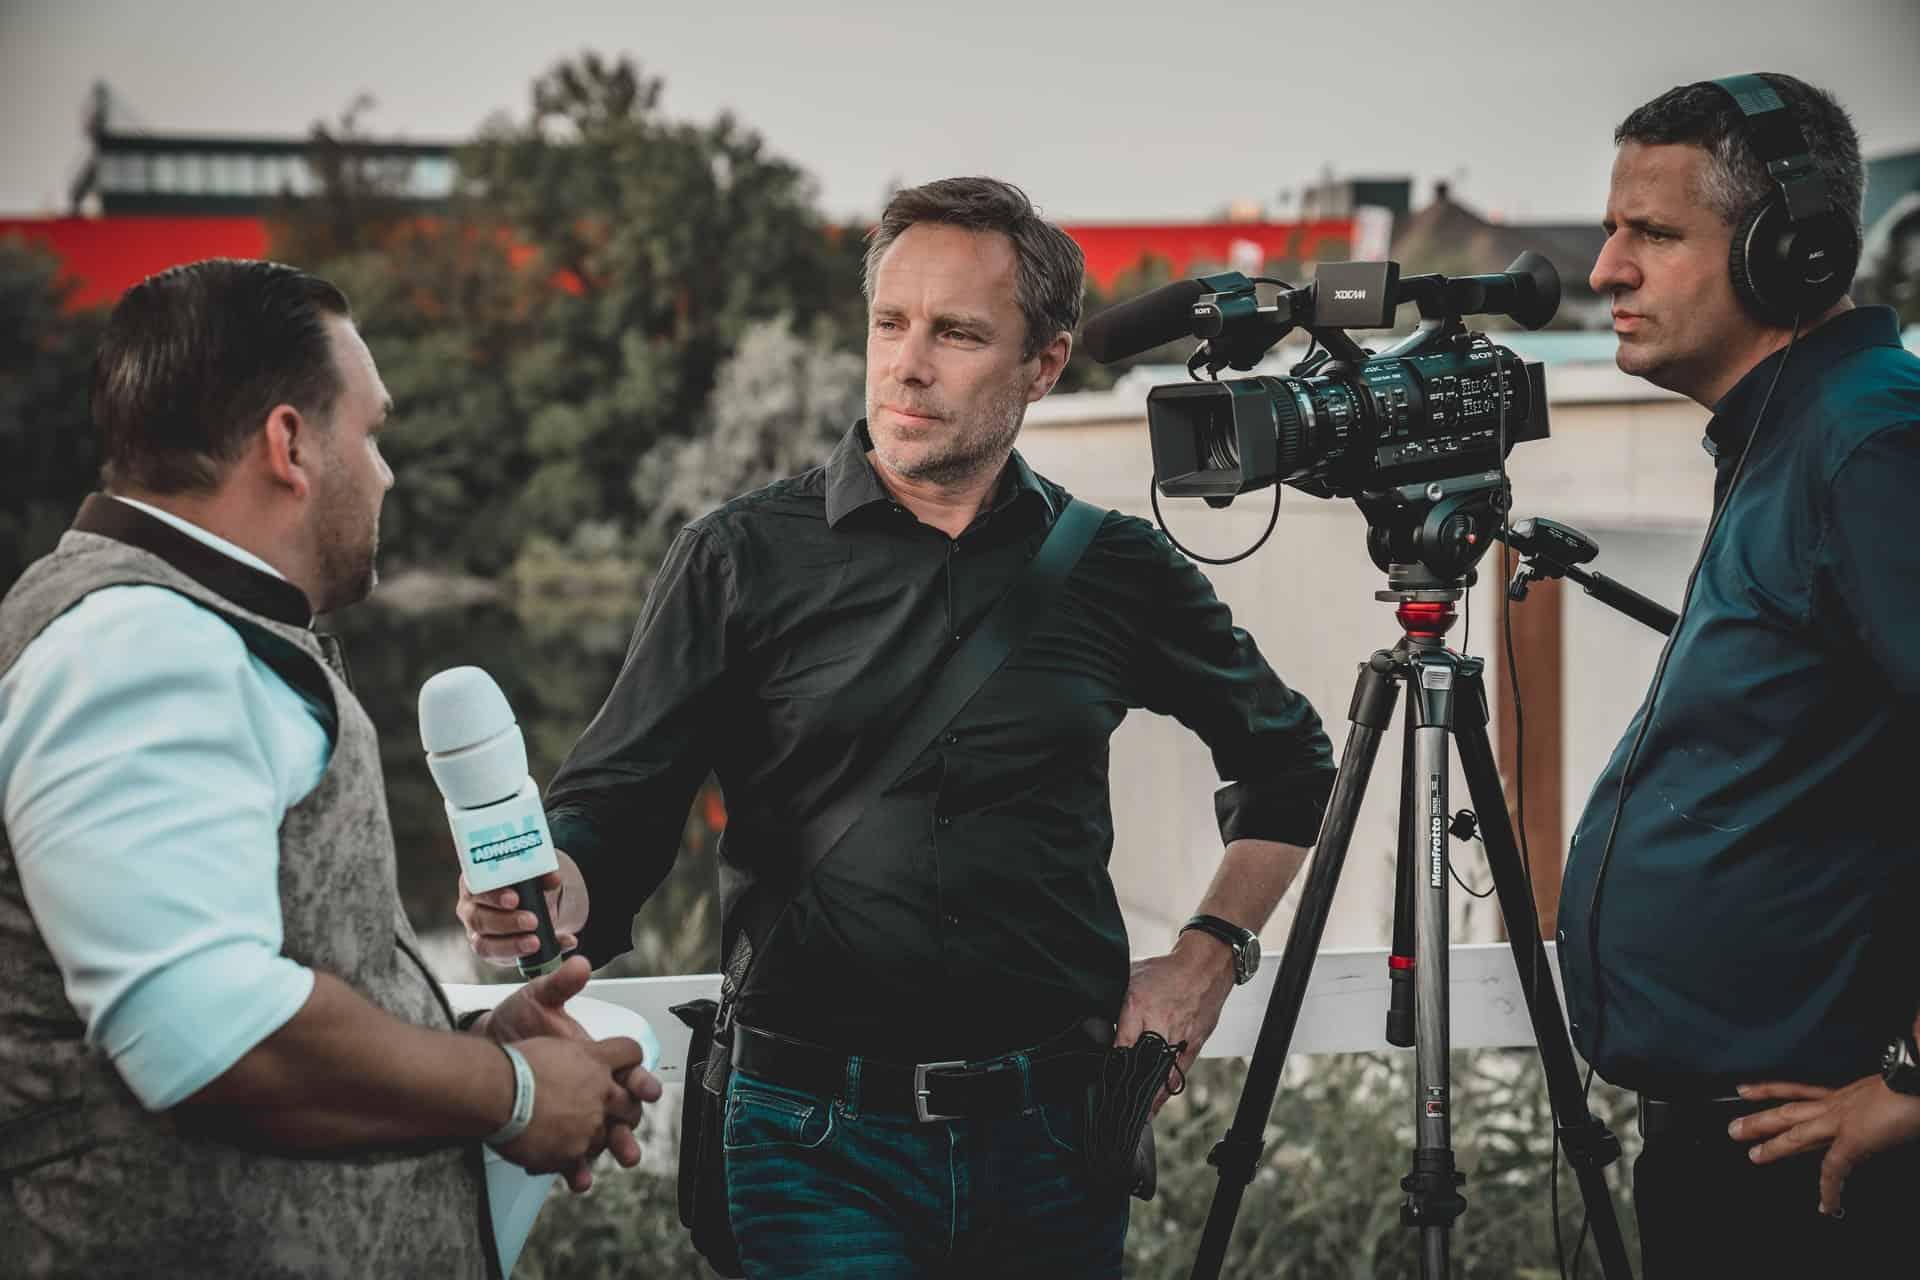 Man giving TV interview